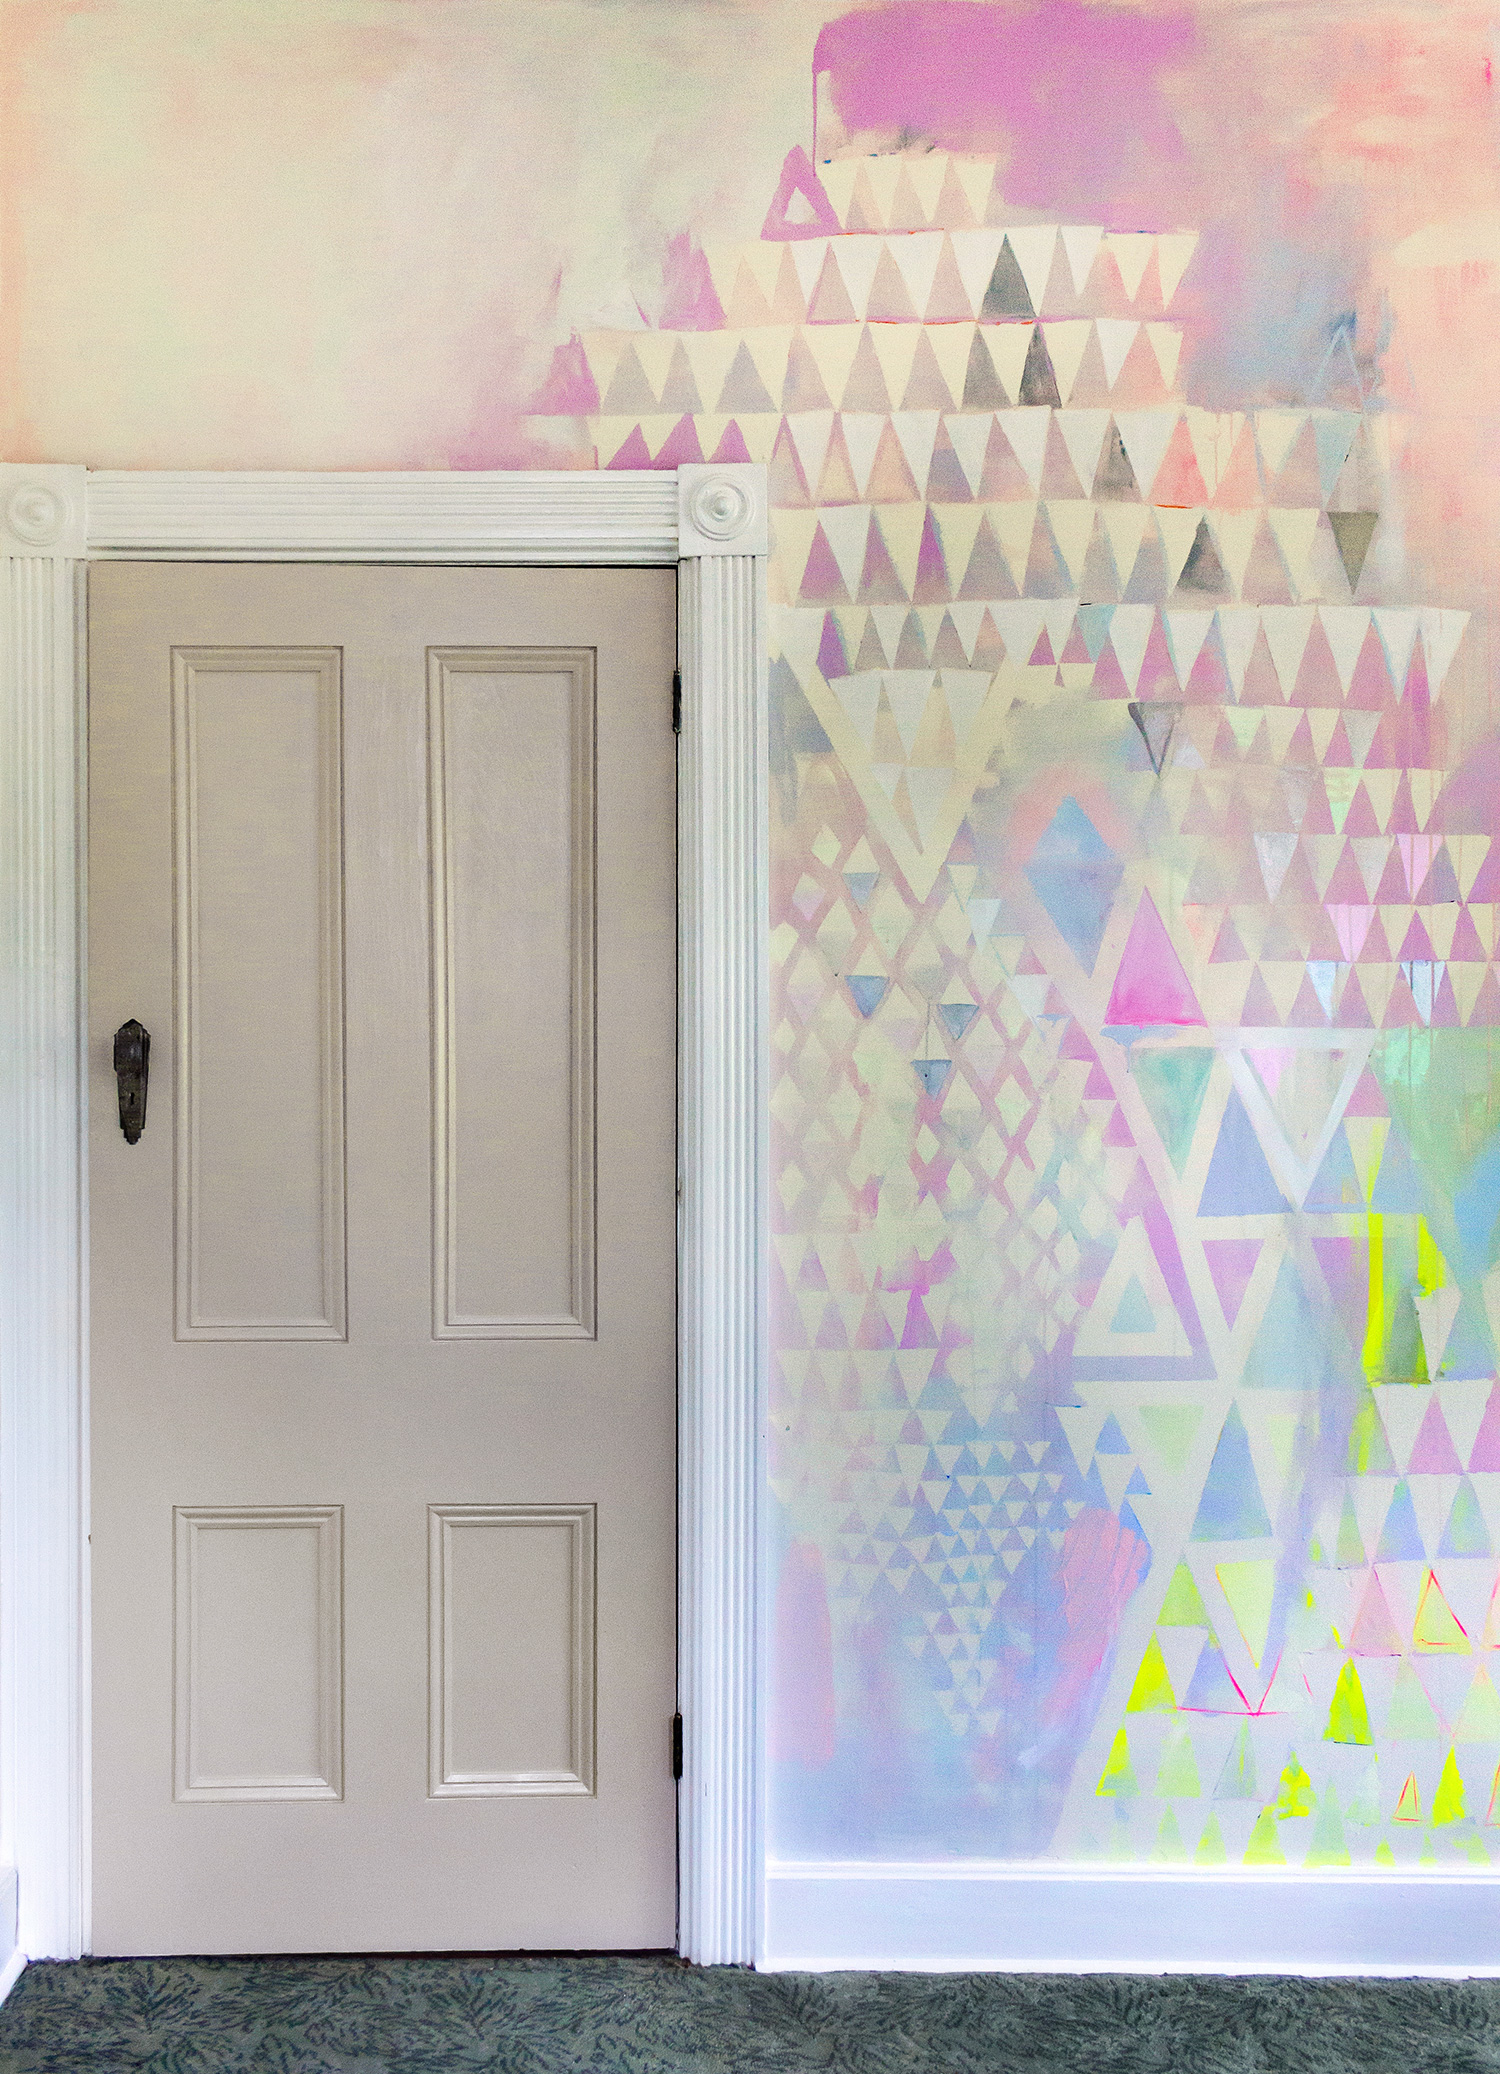 diamond-pastel-mural-camillejaval-07.jpg